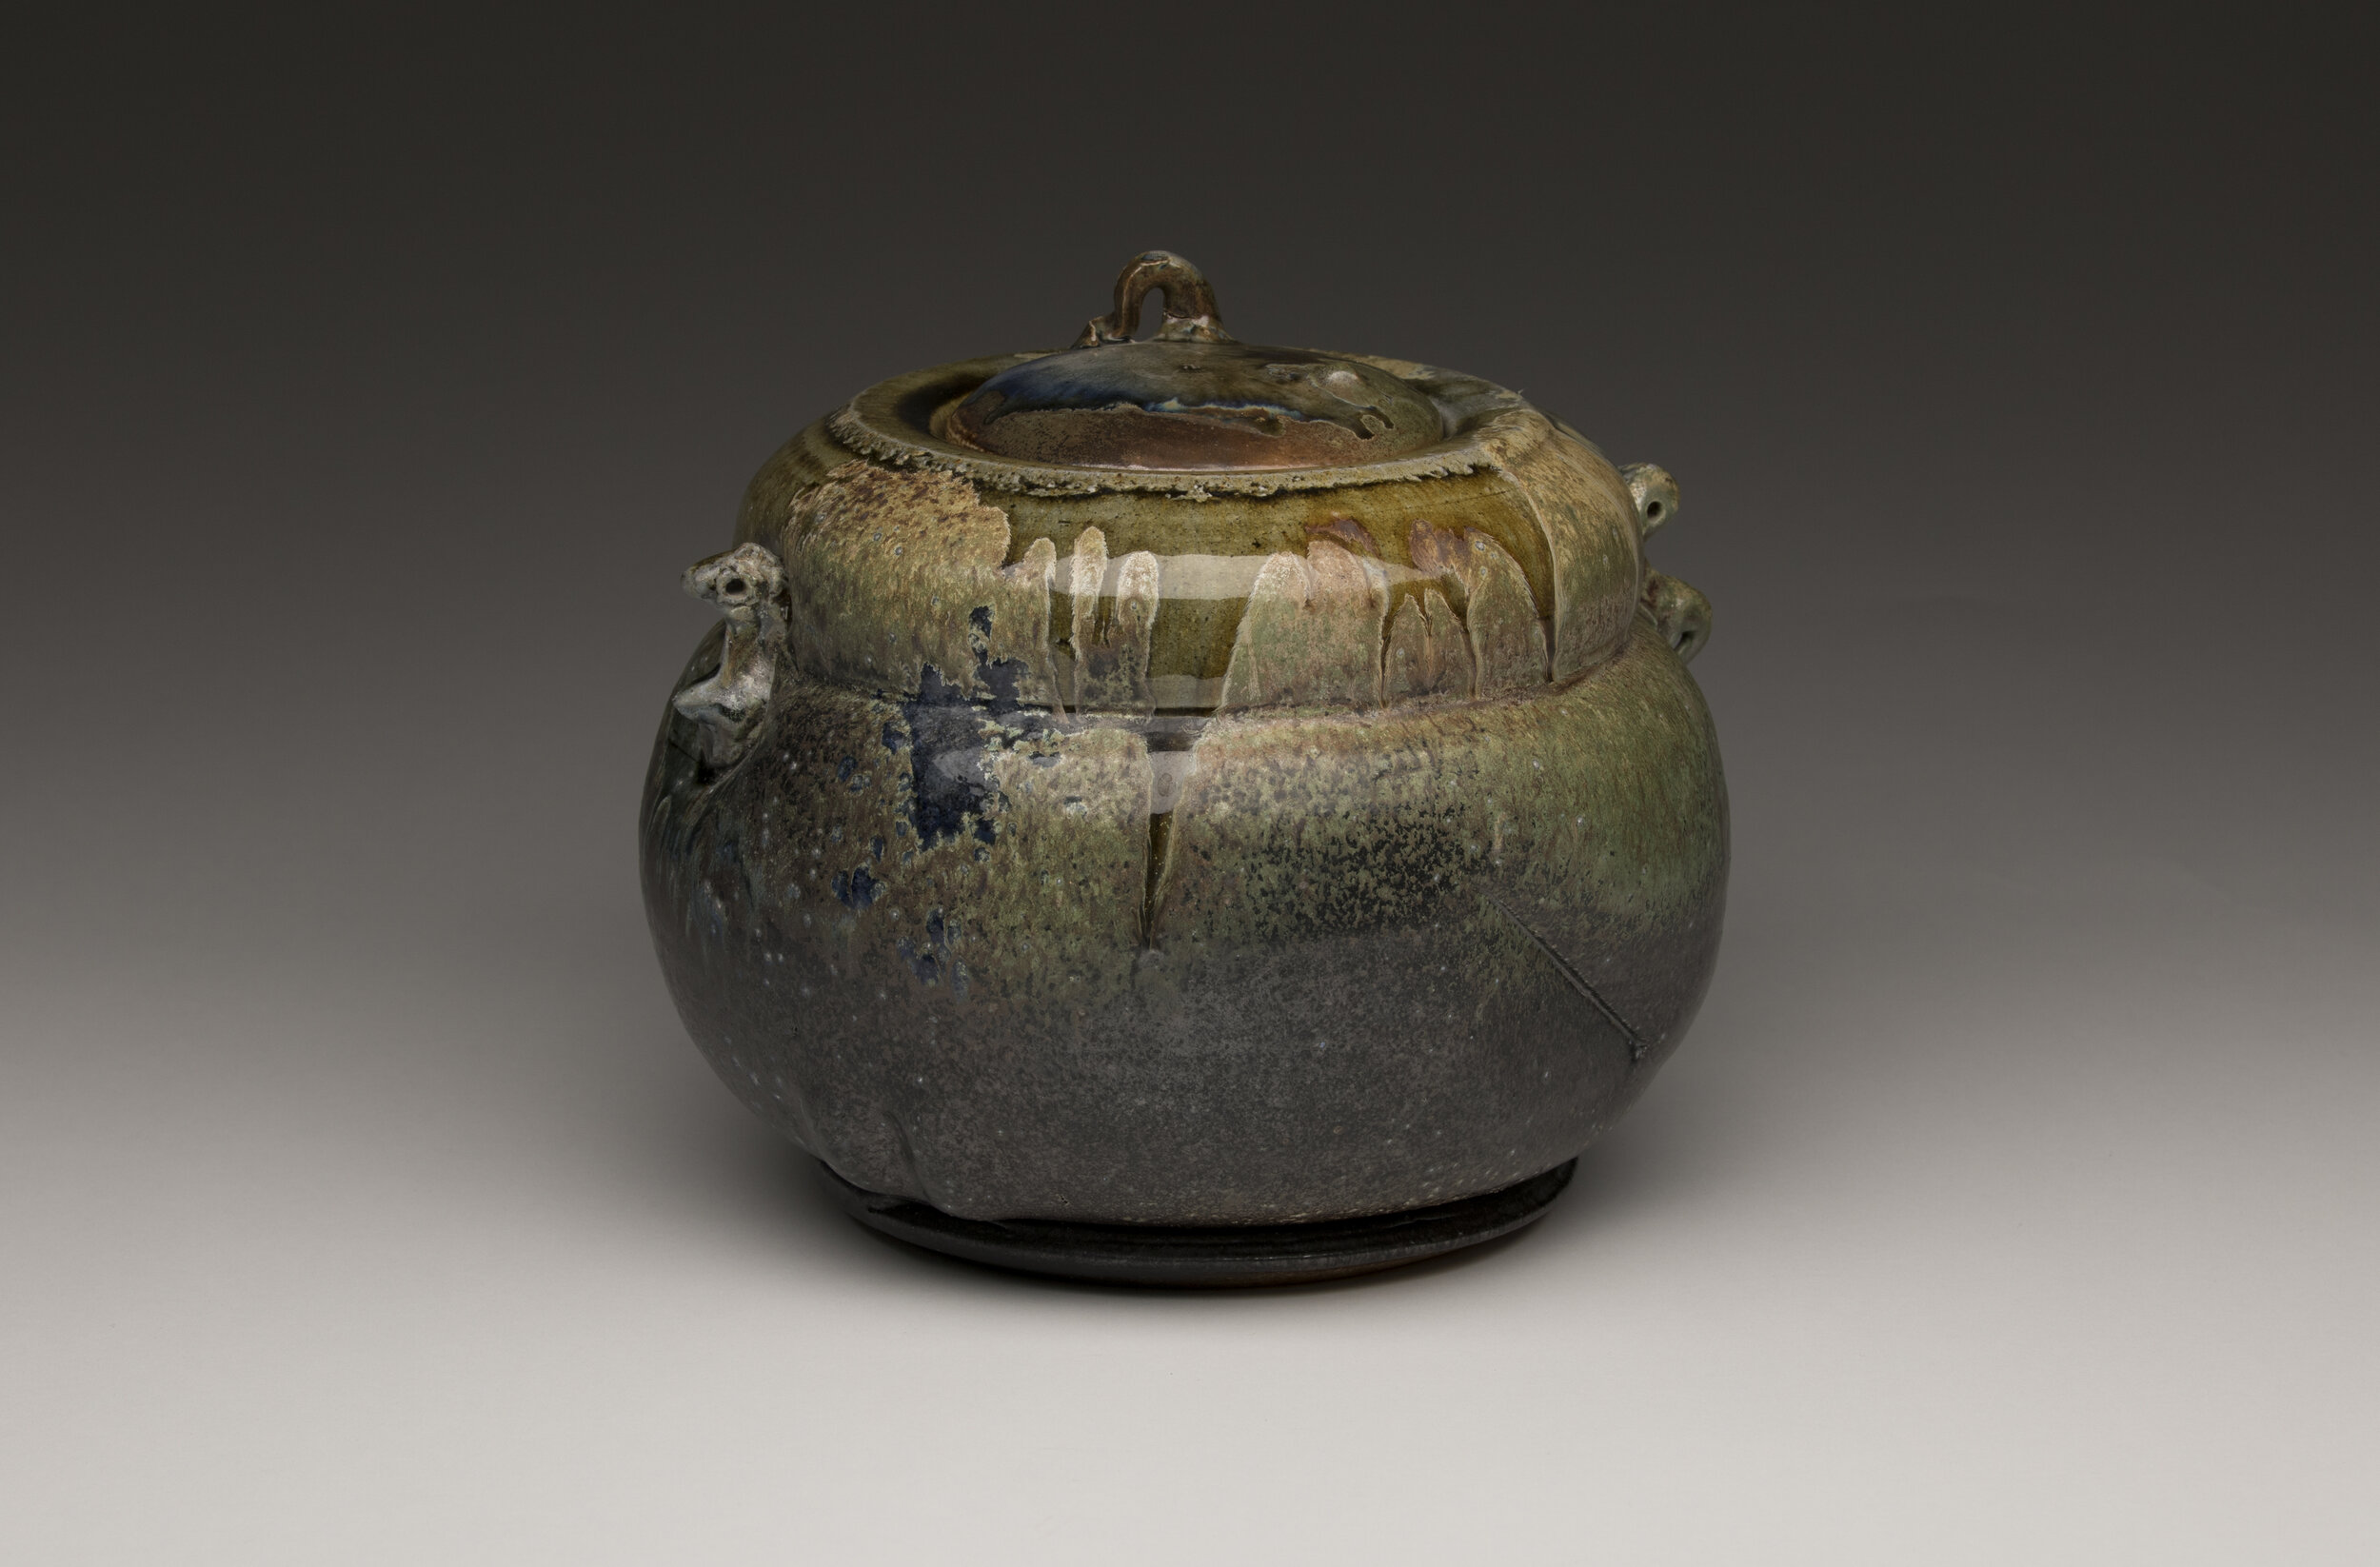 Don Reitz,  Lidded Jar , salt fired stoneware, 1970, 7.75 x 9 x 9 in., Don Reitz Collection